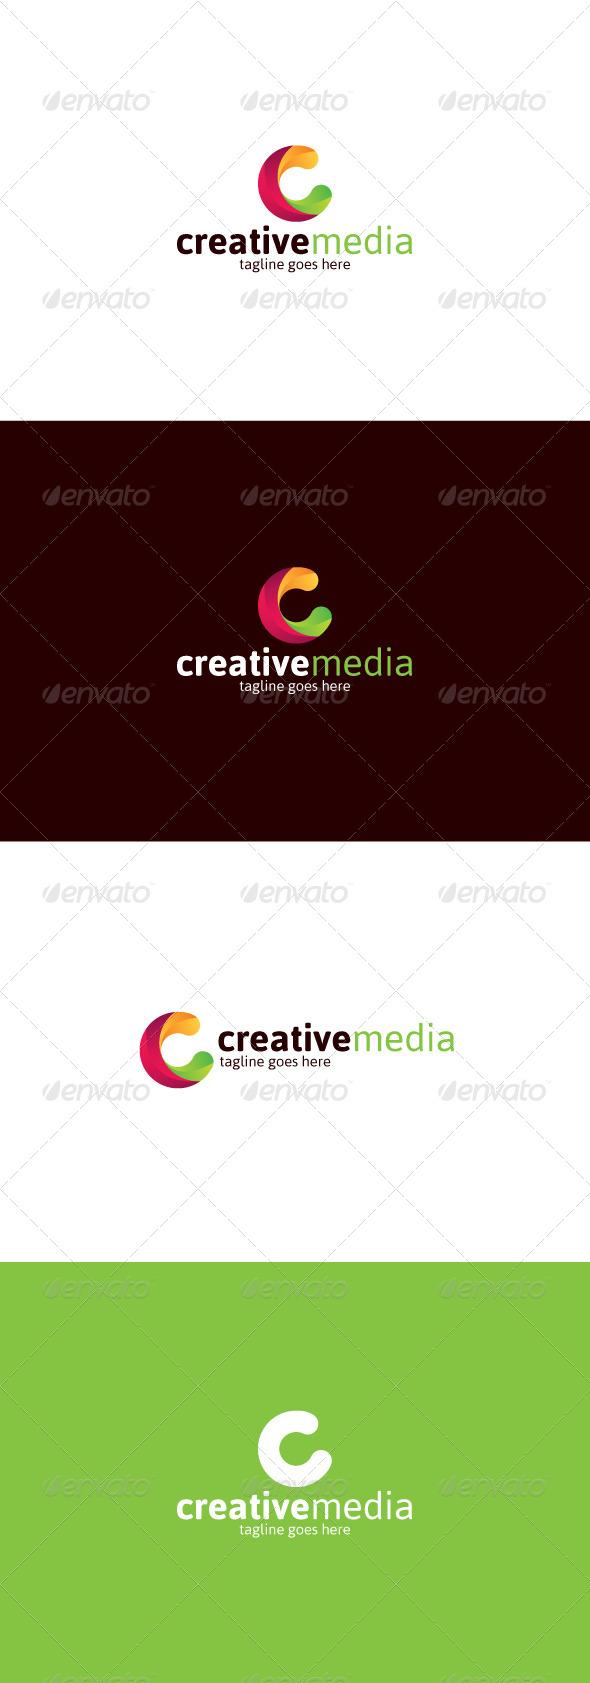 Creative media logo letter c by shaoleen graphicriver creative media logo letter c letters logo templates spiritdancerdesigns Gallery